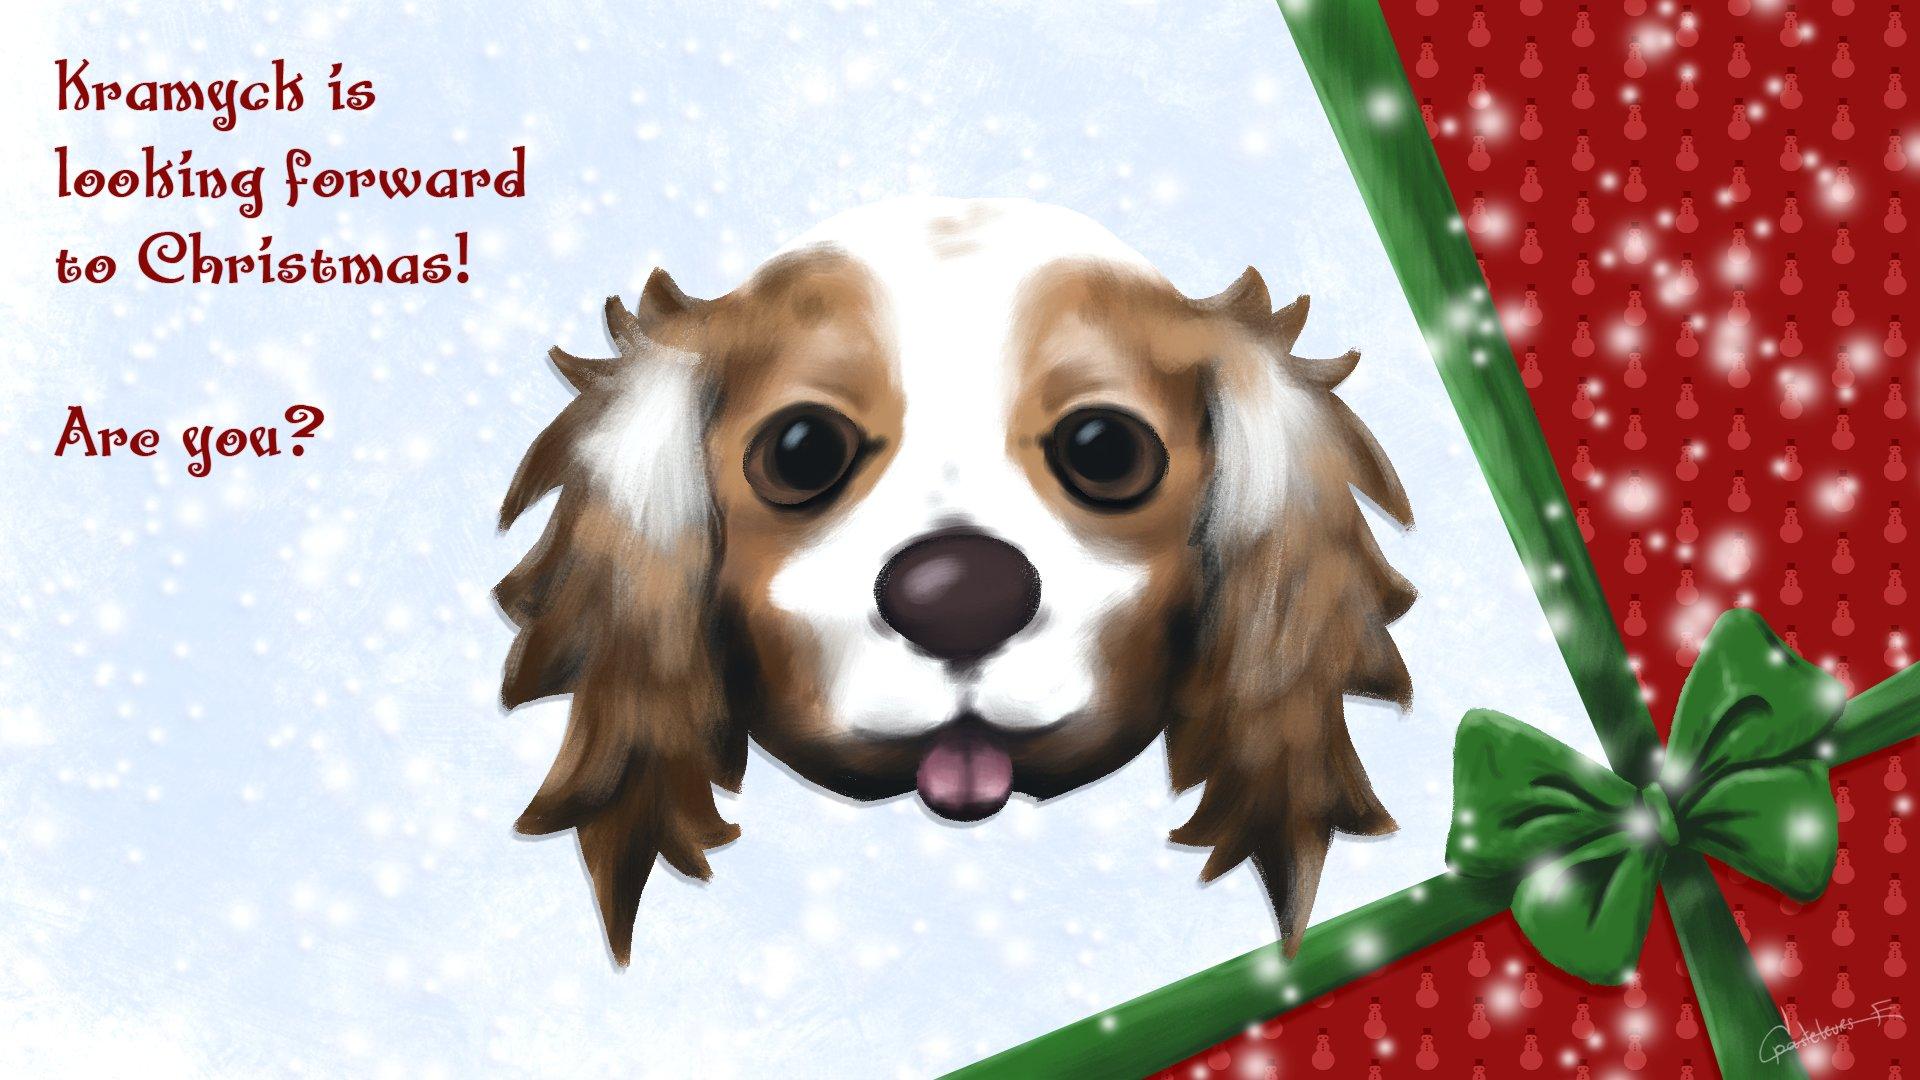 Fabyan pasteleurs christmascard 2014 kramyck eng